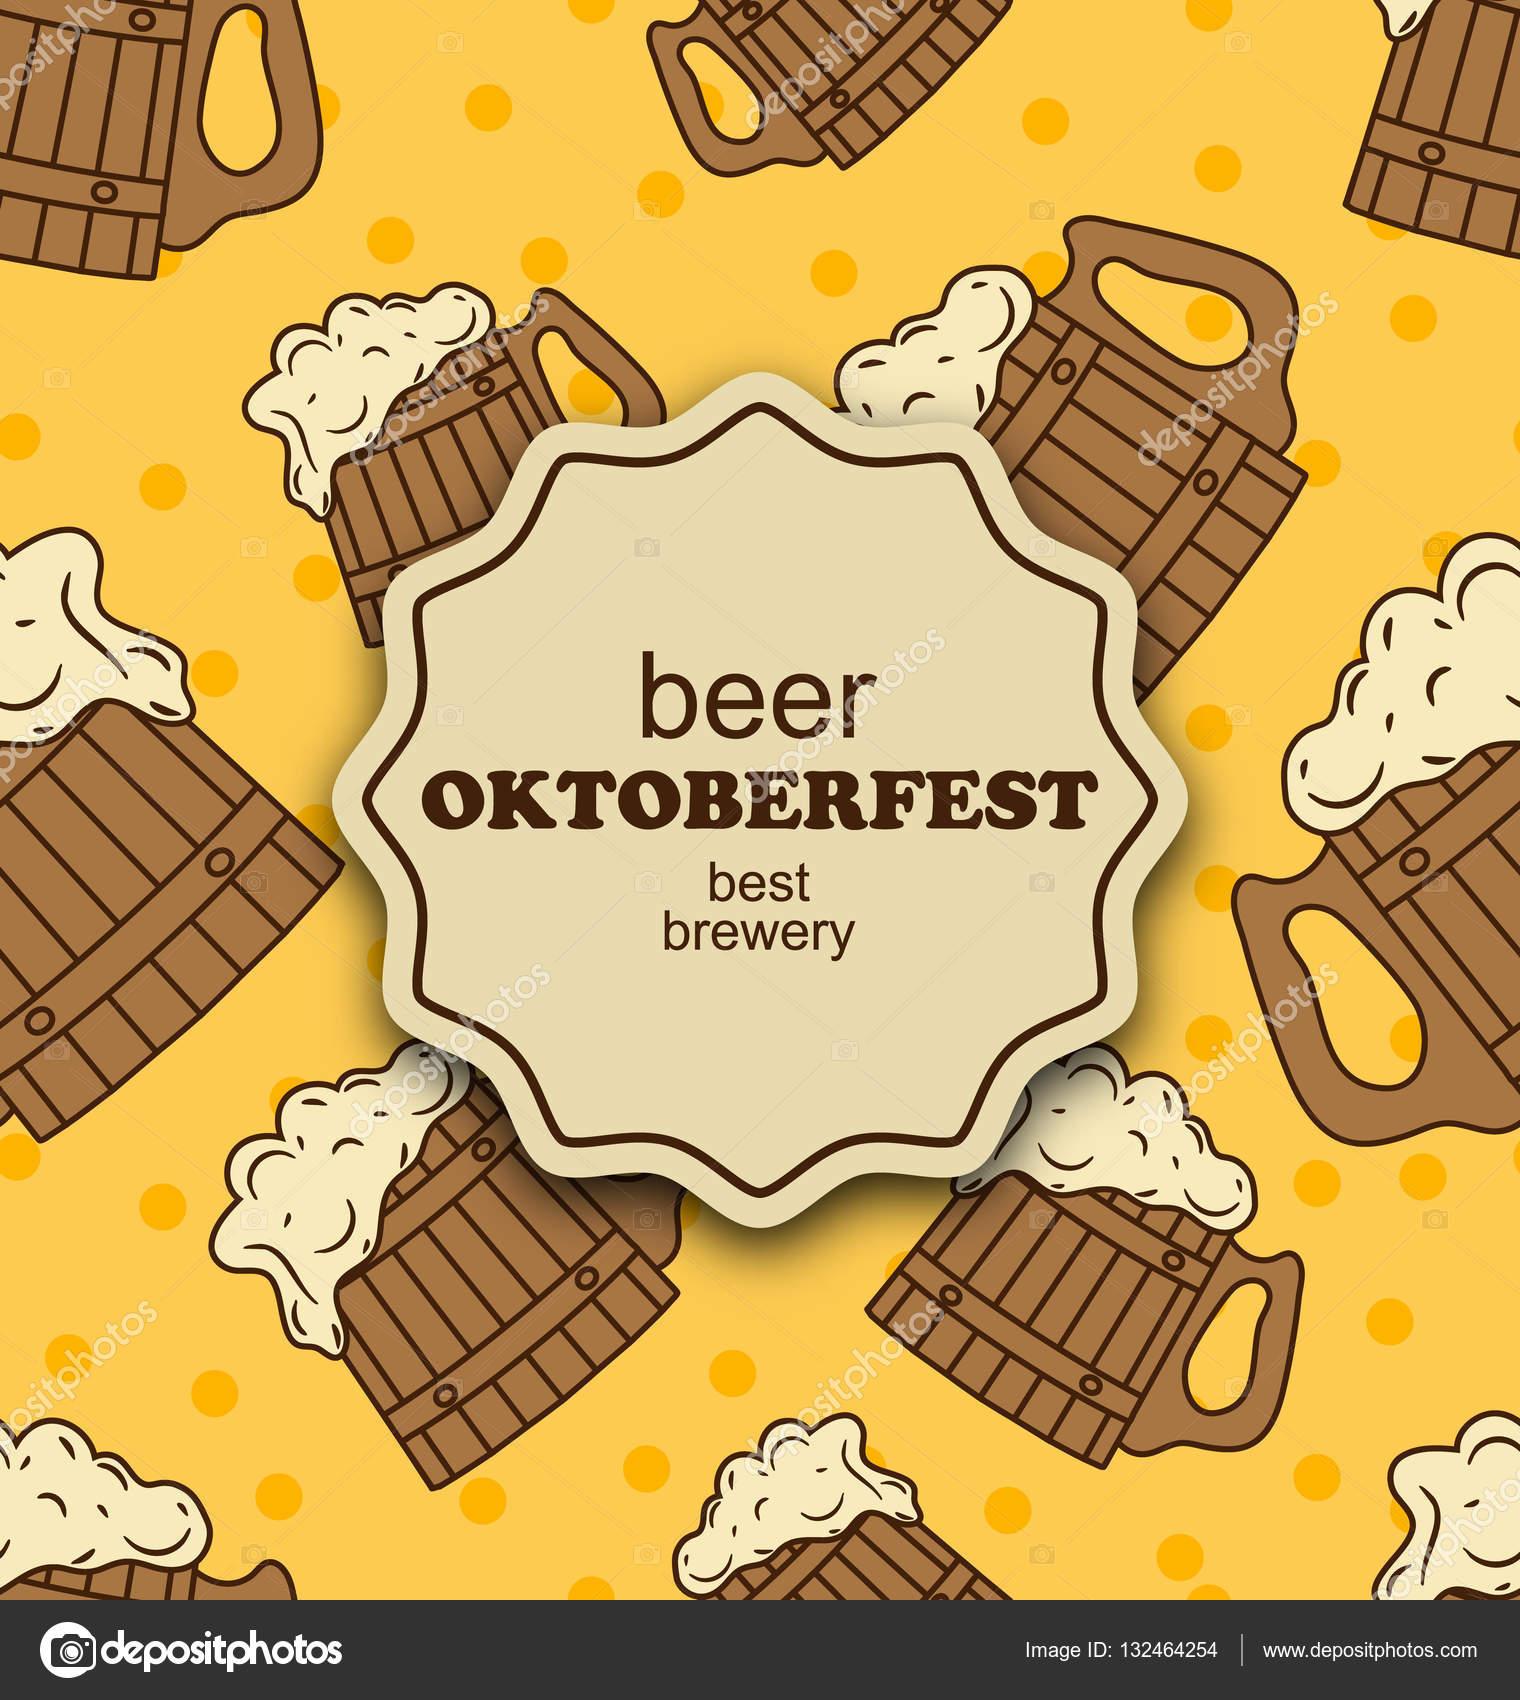 Grußkarte für Oktoberfest Party — Stockfoto © smeagorl #132464254